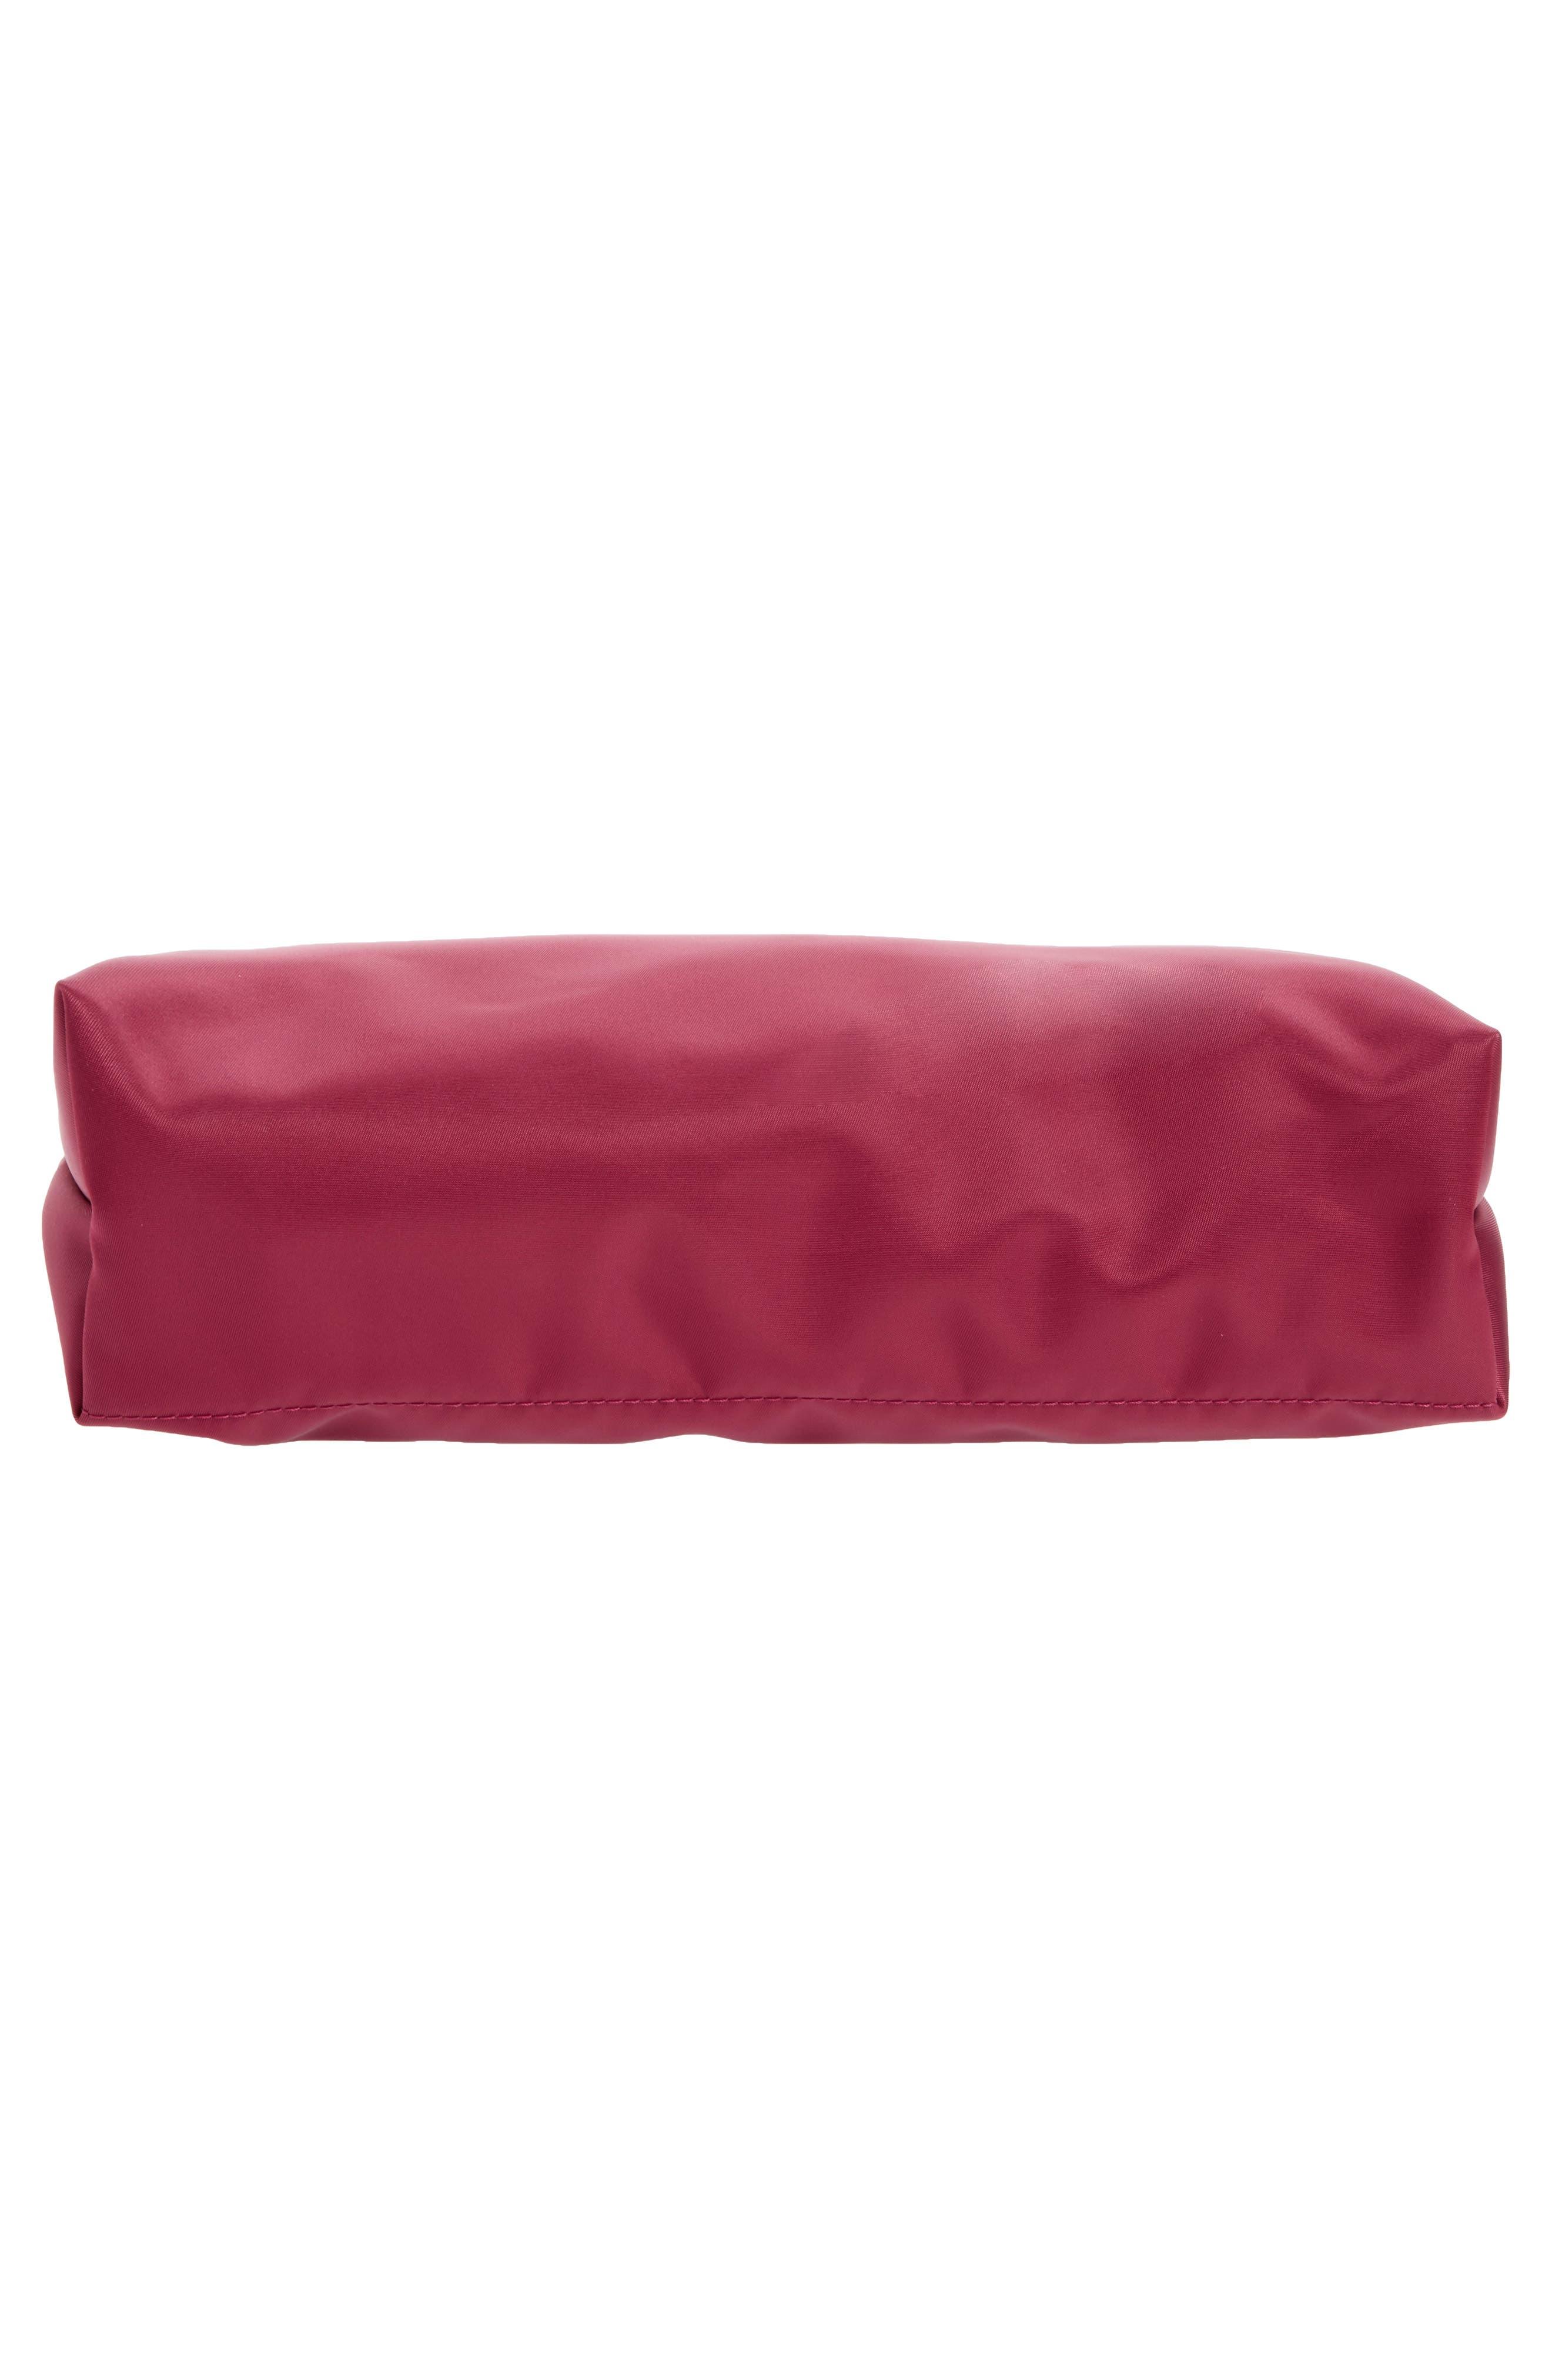 Le Pliage Neo Nylon Crossbody Bag,                             Alternate thumbnail 6, color,                             650